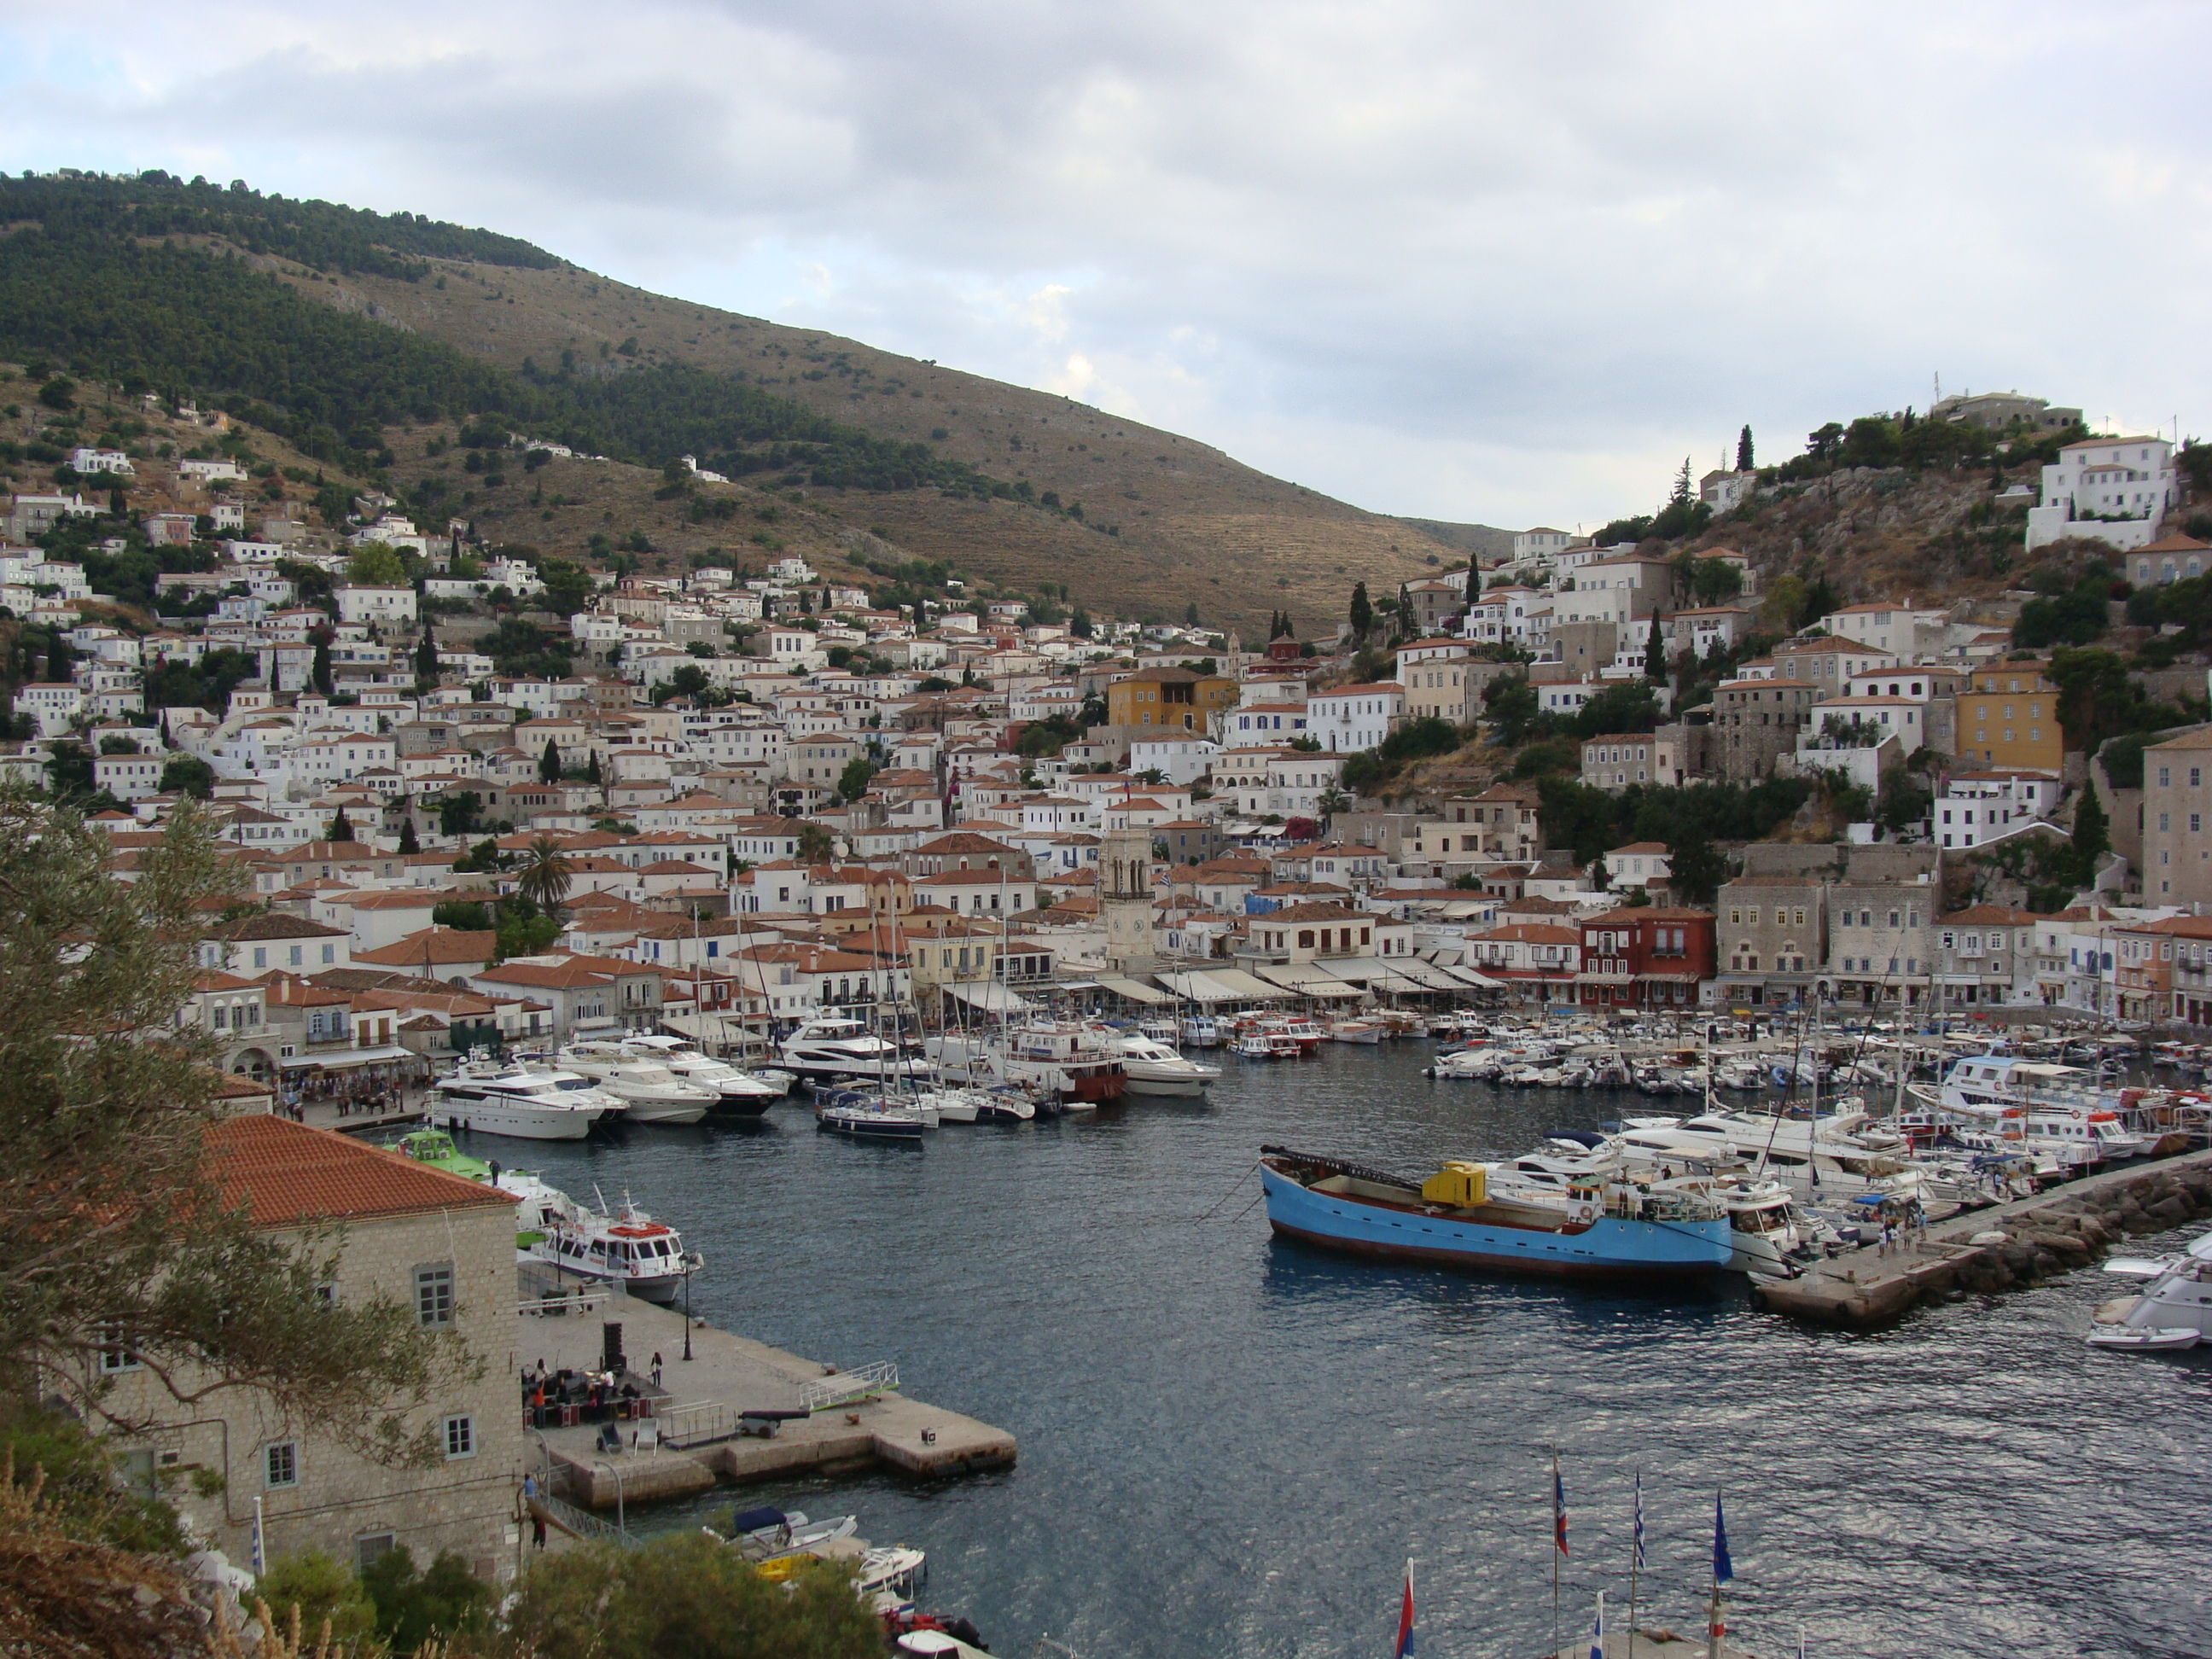 The historic port of Hydra - a wonderful sailing destination